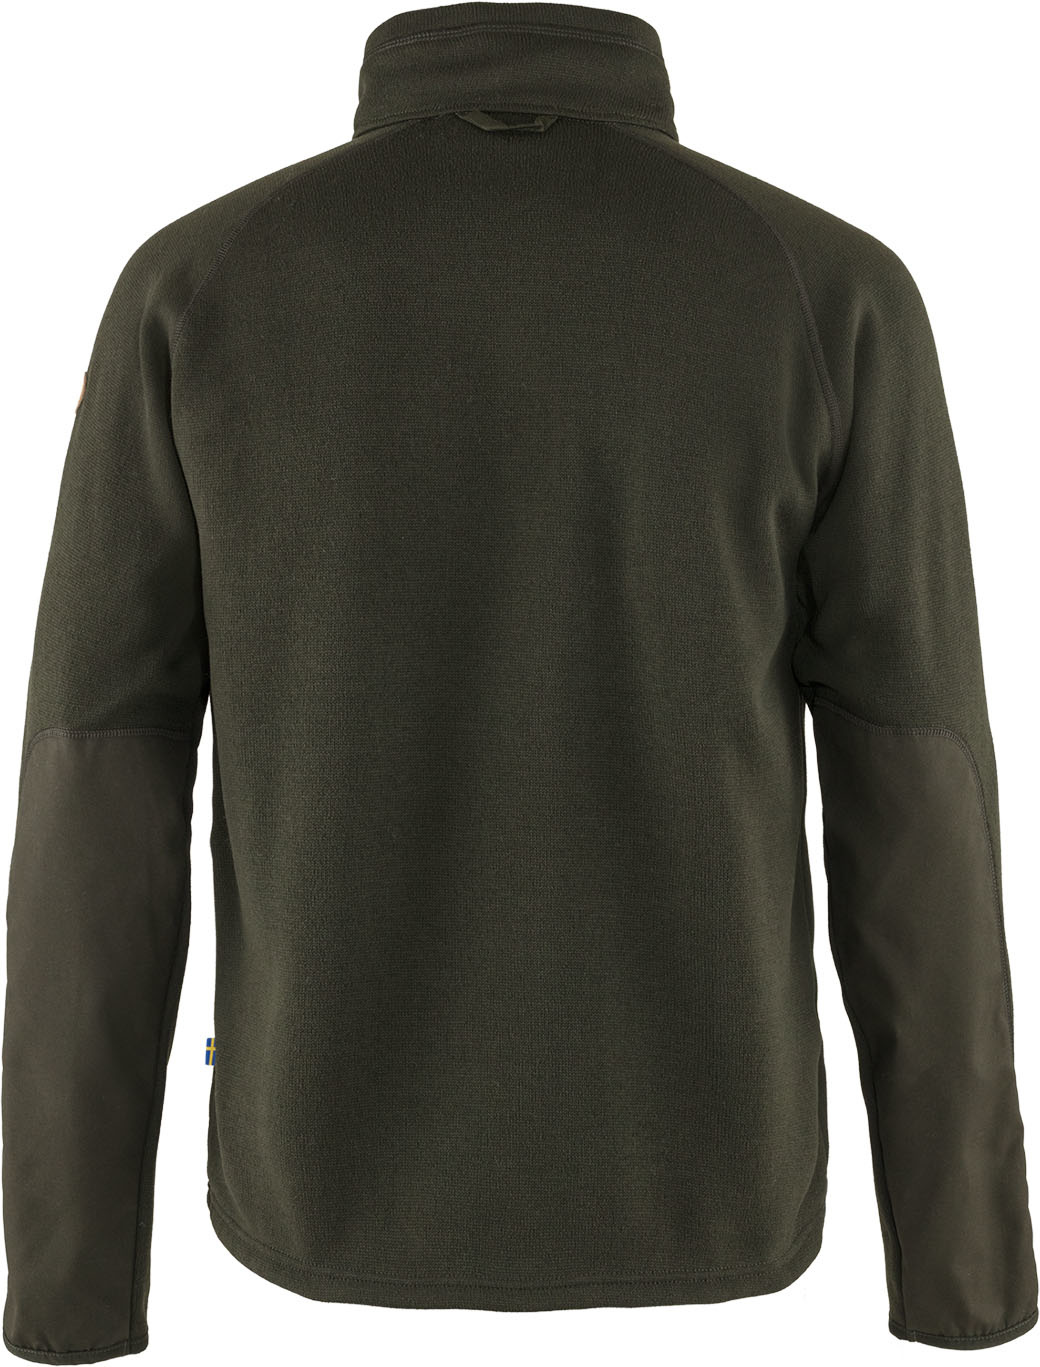 Fjällräven Övik Fleece Zip Sweater M Deep Forest-4